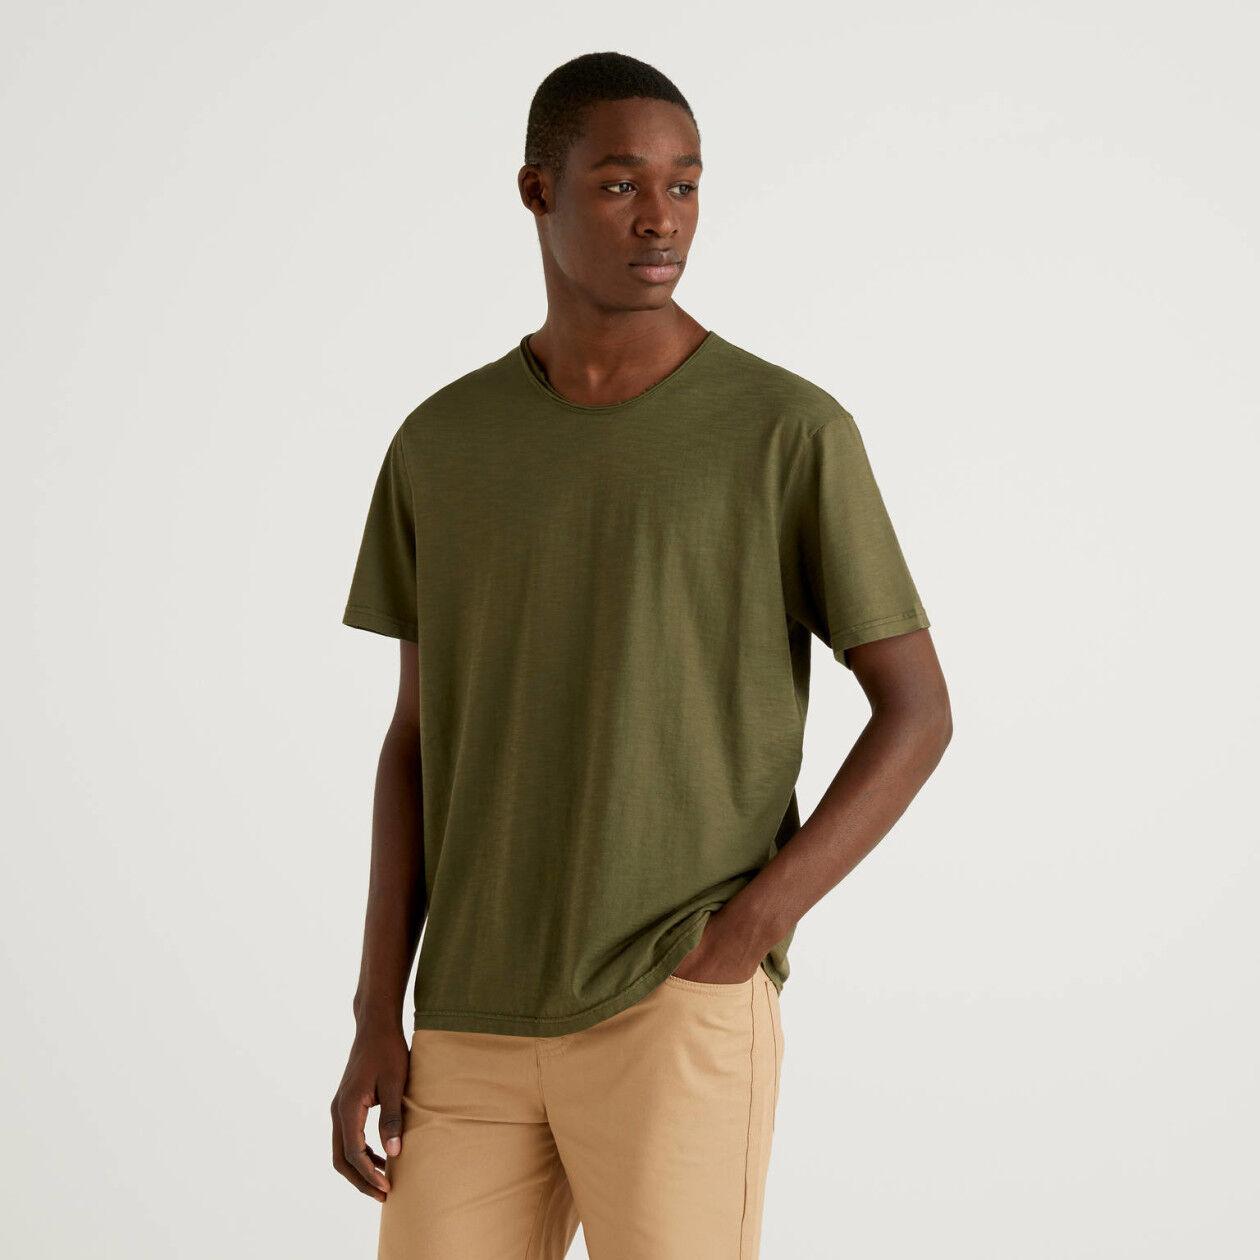 Camiseta verde militar de 100% algodón